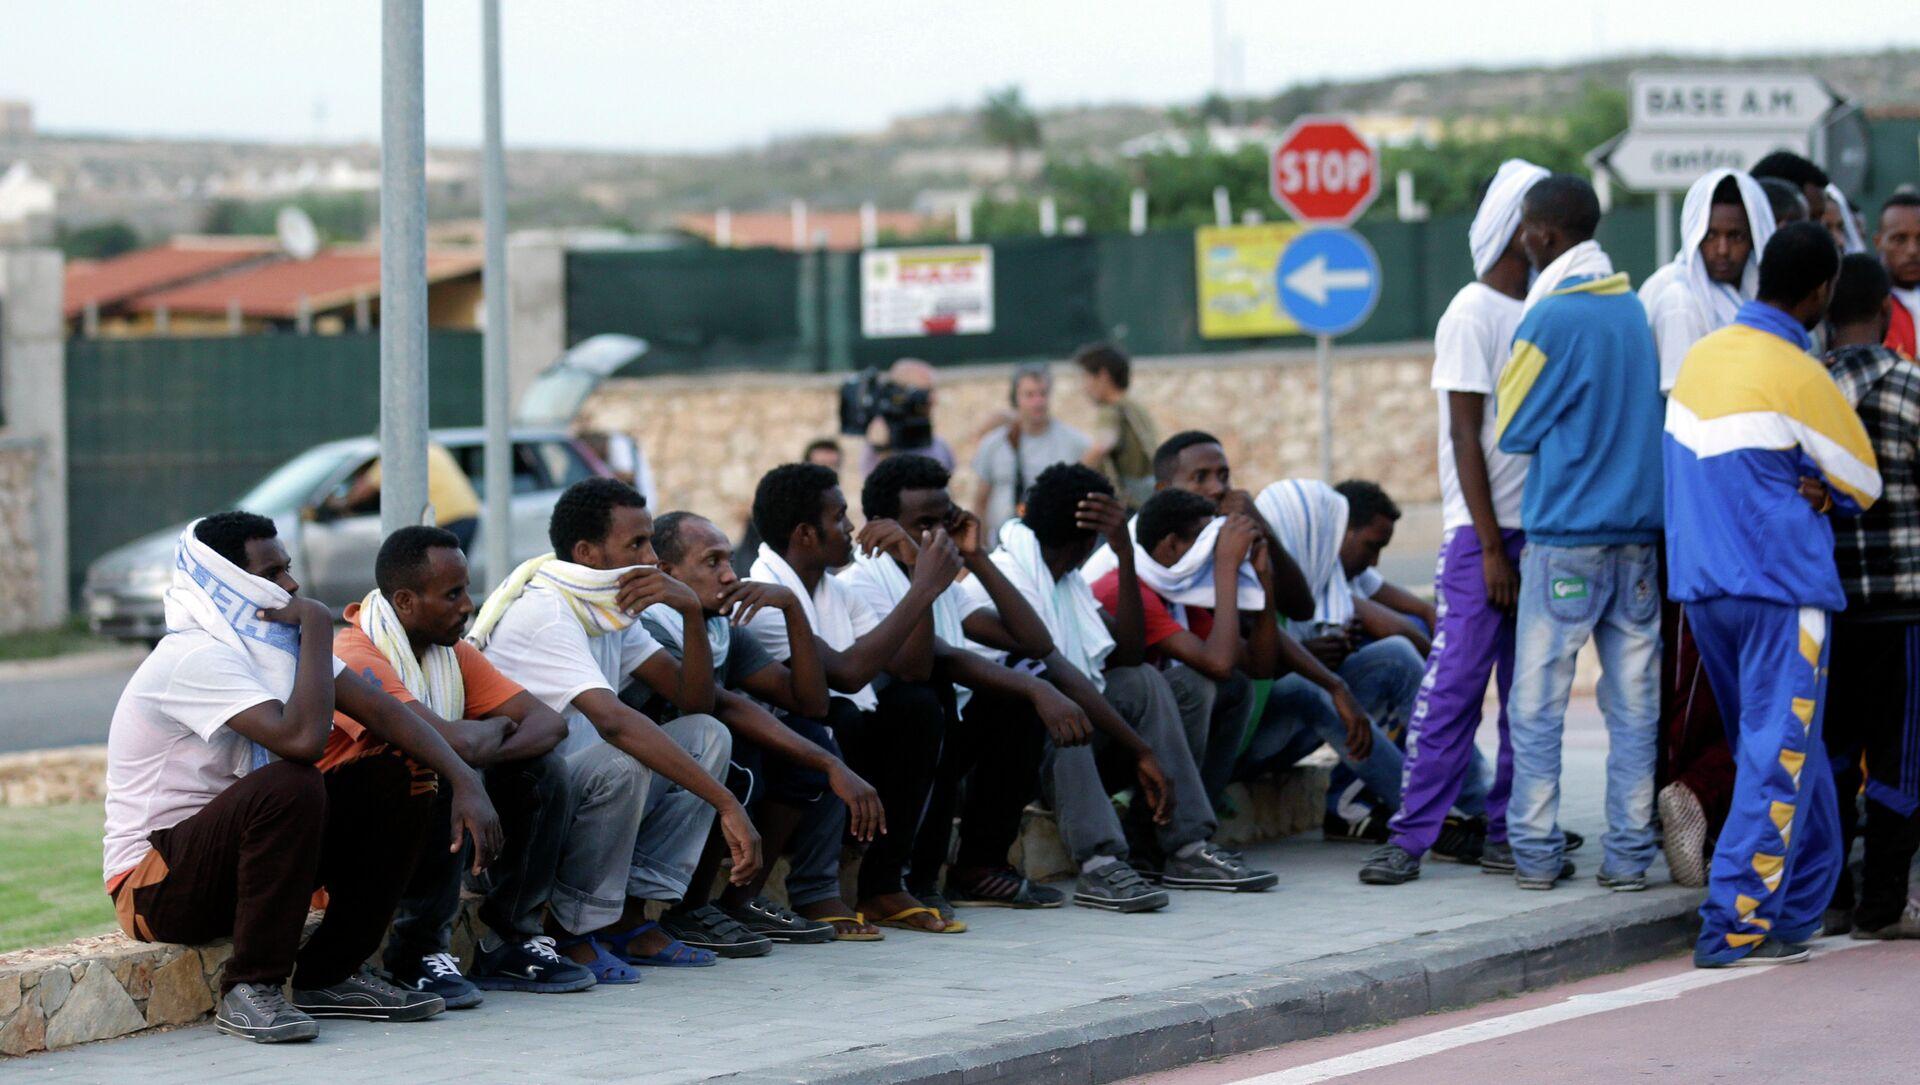 Migranti dall'Eritrea a Lampedusa - Sputnik Italia, 1920, 01.03.2021